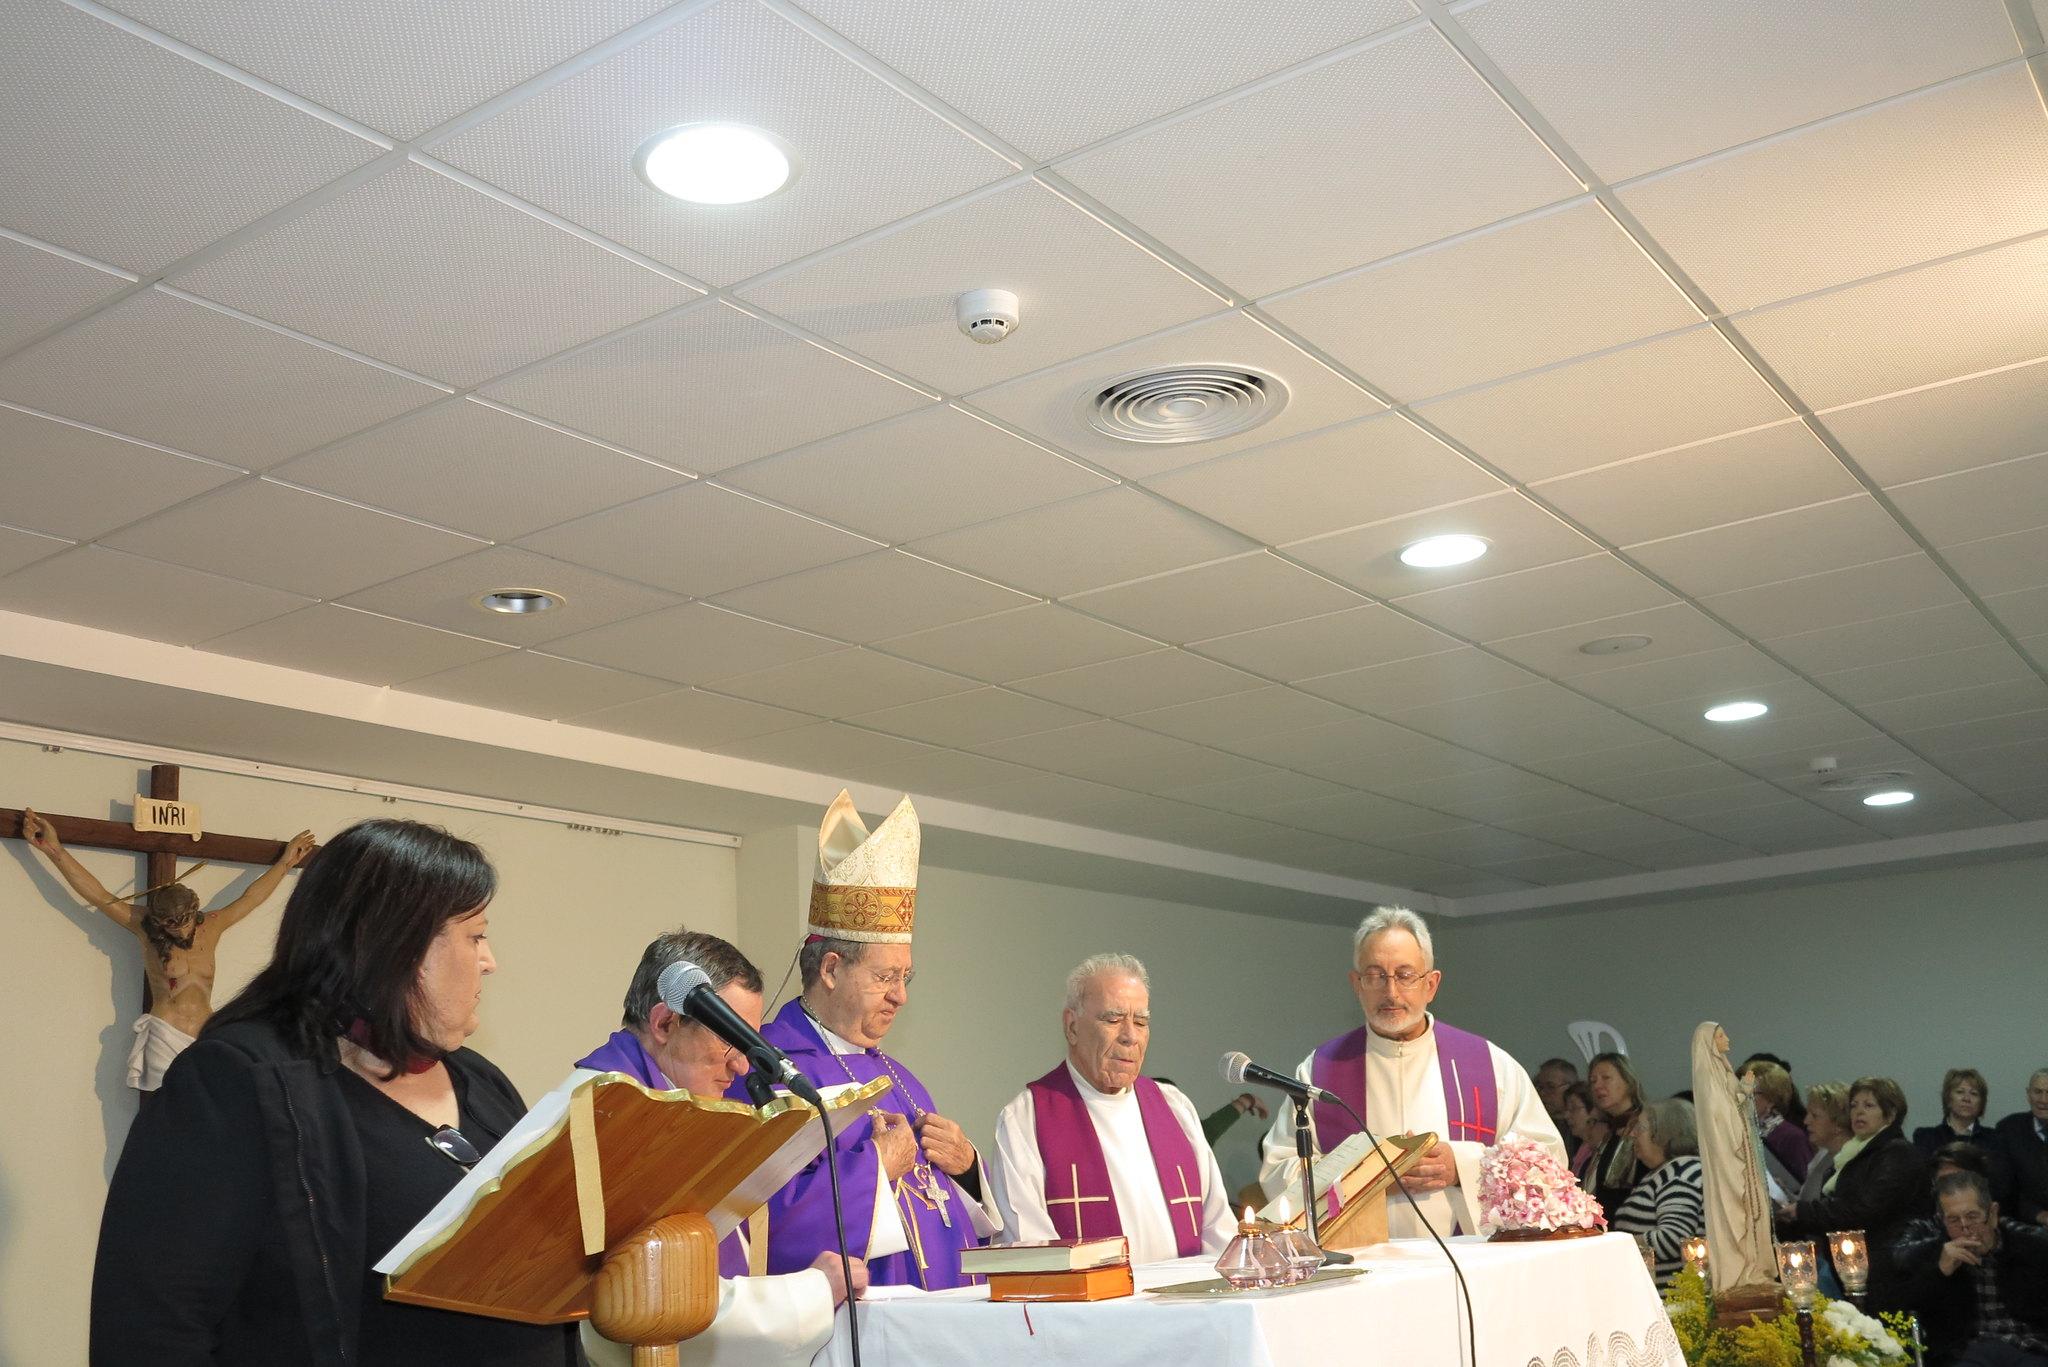 (2016-02-13) - Inauguración Virgen de Lourdes, La Molineta - Archivo La Molineta 2 (01)